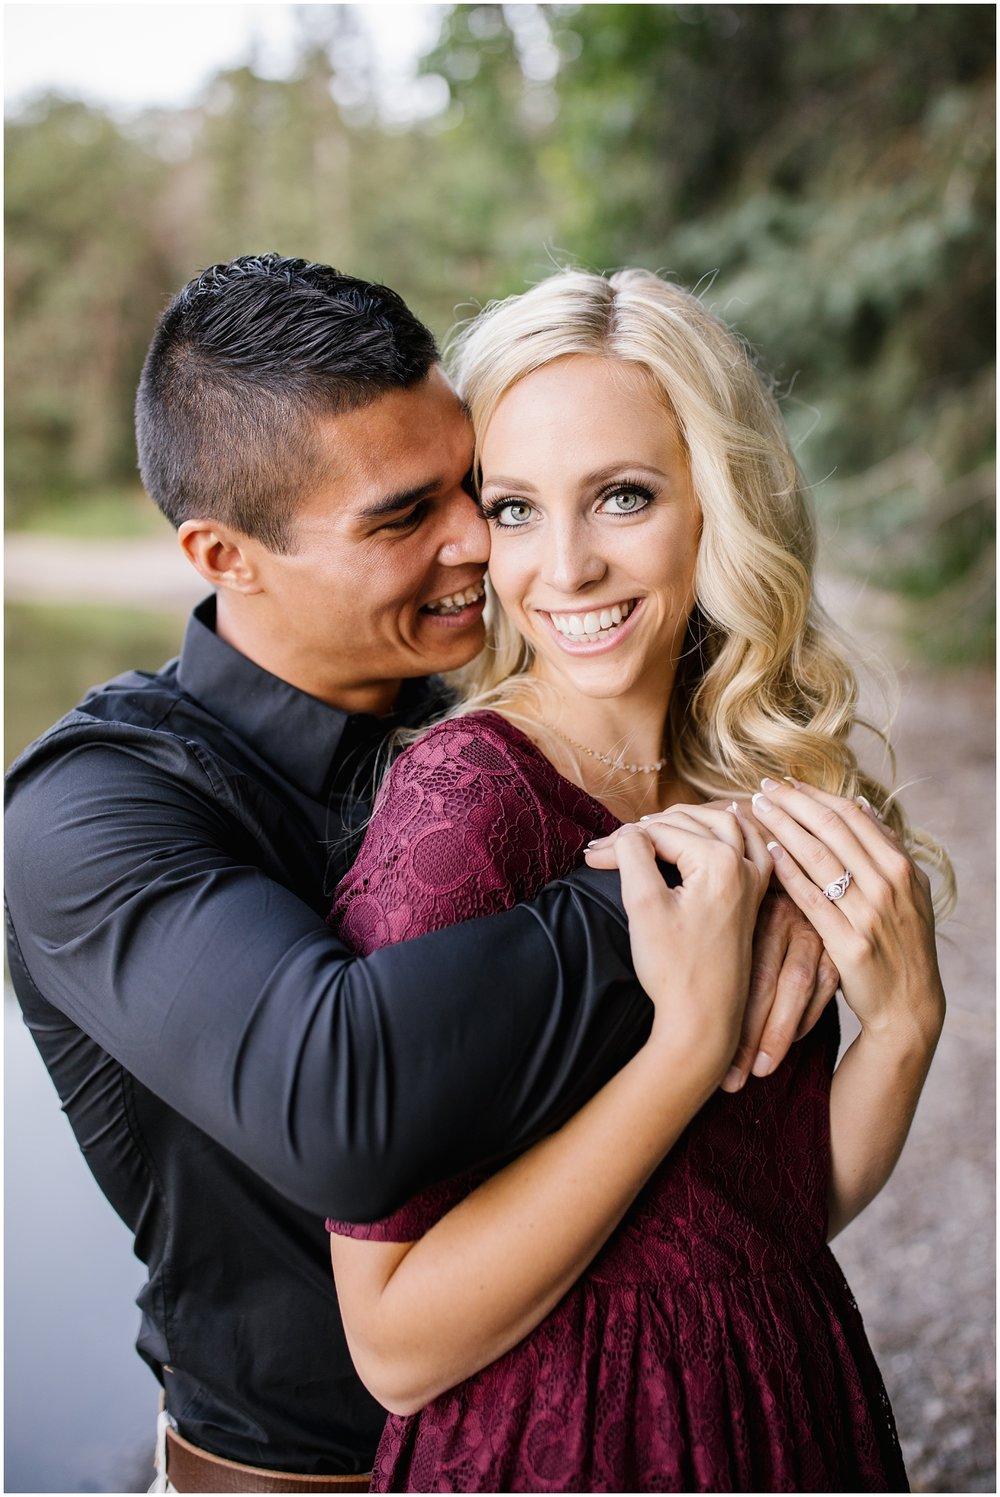 HCengagements-76_Lizzie-B-Imagery-Utah-Wedding-Photographer-Park-City-Salt-Lake-City-Payson-Canyon-Engagement-Session.jpg